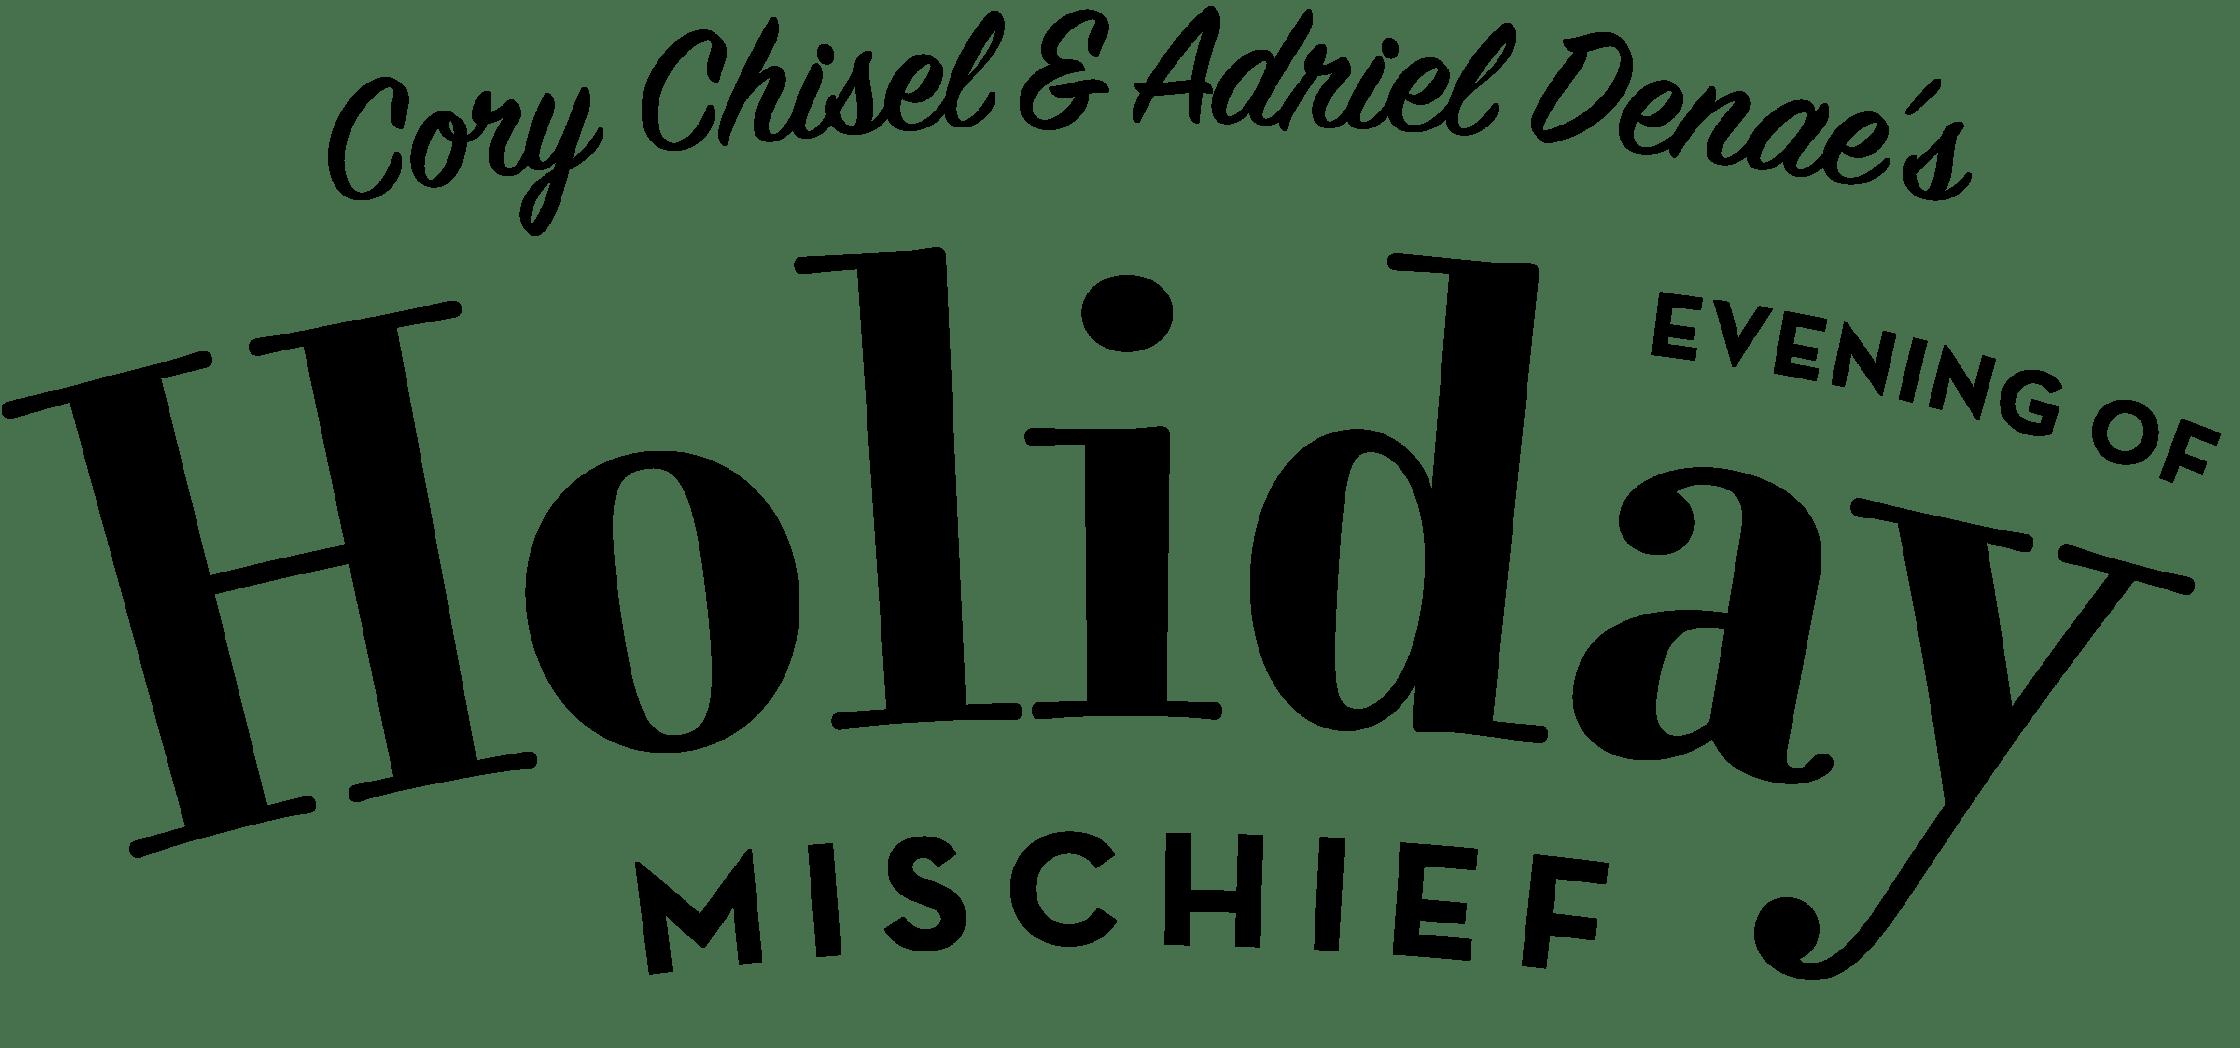 2018 Evening of Holiday Mischief Branding